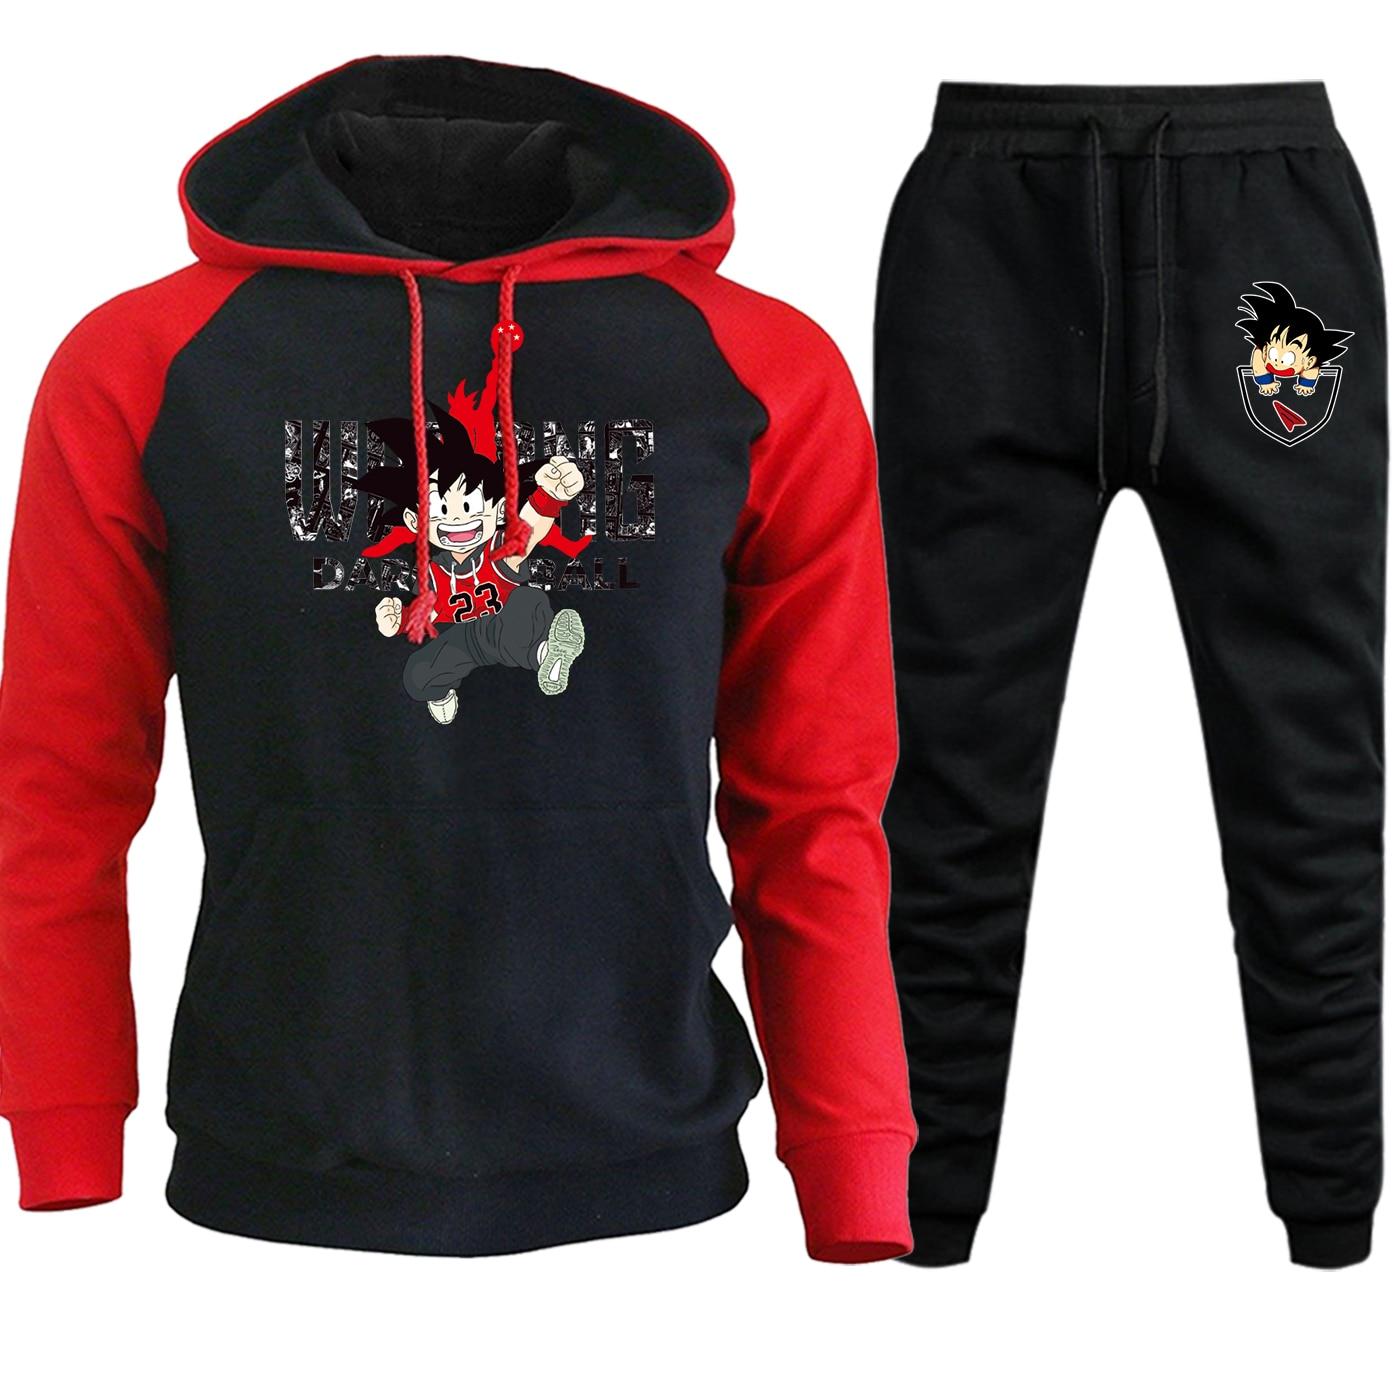 Streetwear Mens Raglan Hooded Autumn Winter 2019 Dragon Ball Cartoon Casual Fleece Sweatshirt Hoodie Suit+Sweatpants 2 Piece Set